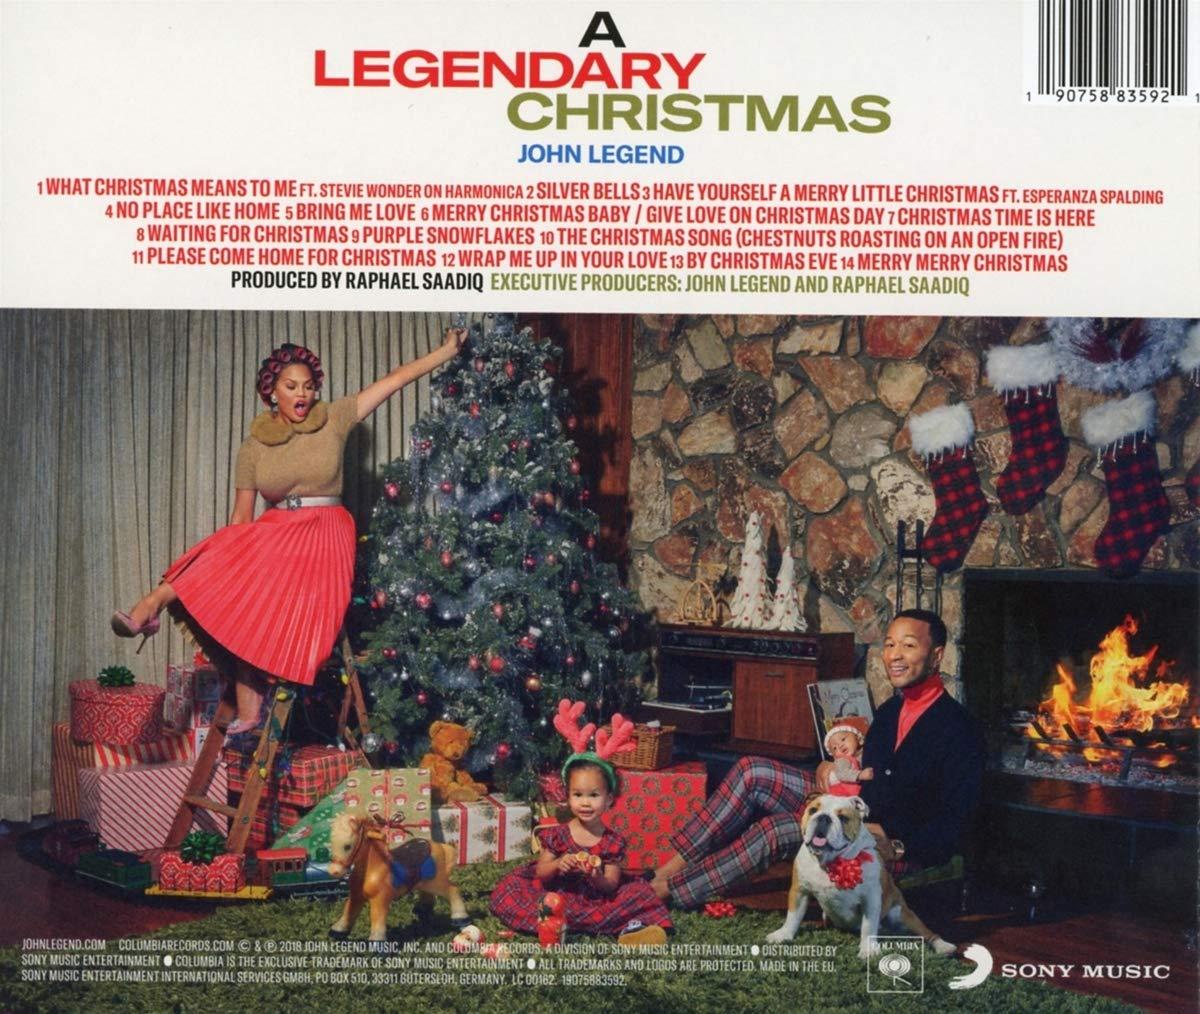 John Legend - A Legendary Christmas - Amazon.com Music